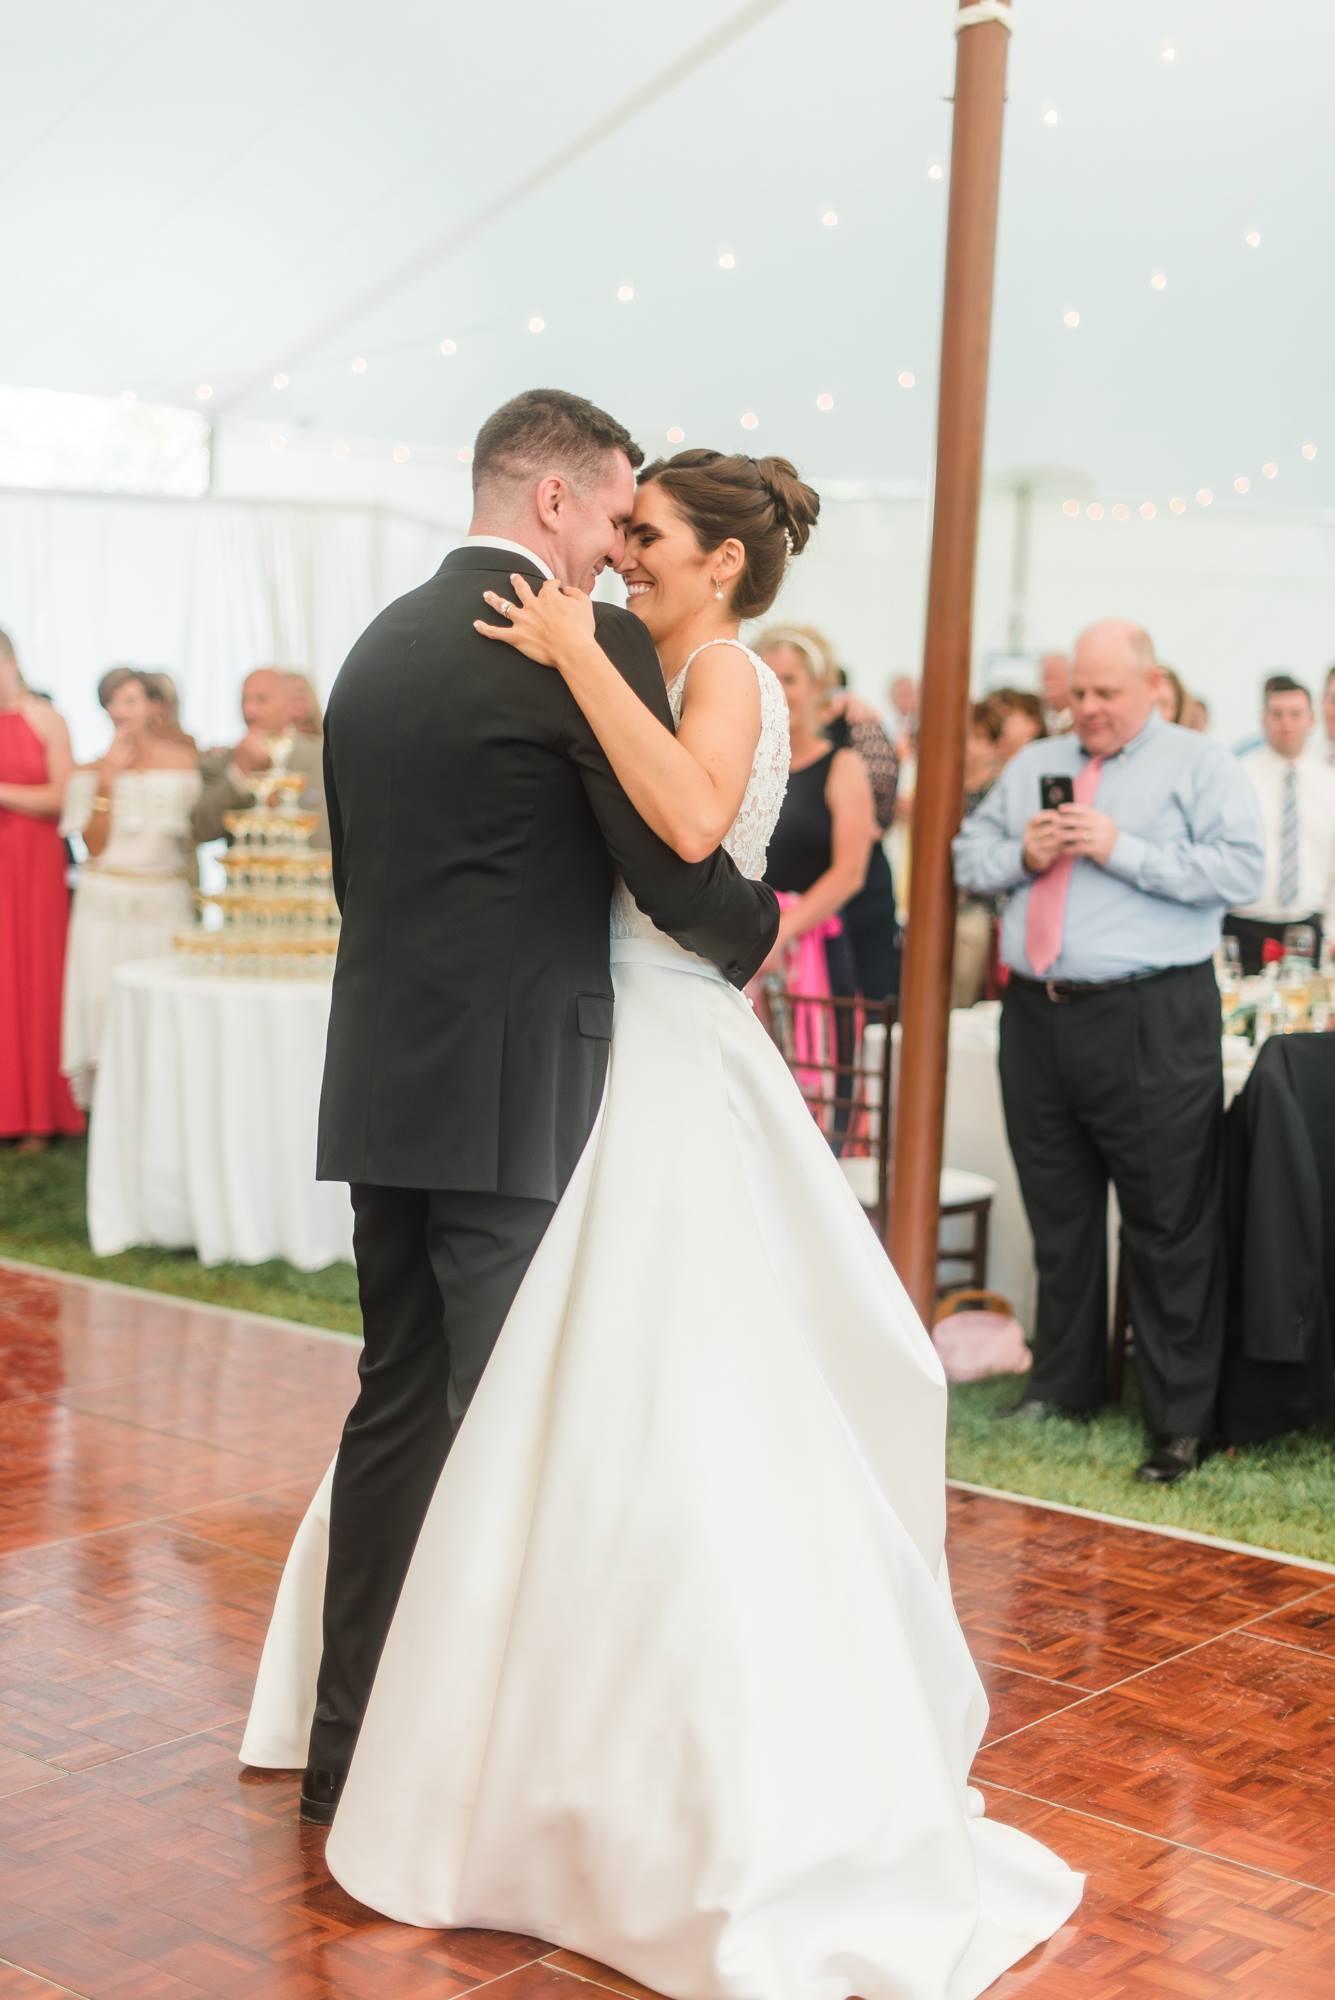 pittsburgh-pennsylvania-backyard-glam-chic-modern-classic-wedding-0035.jpg